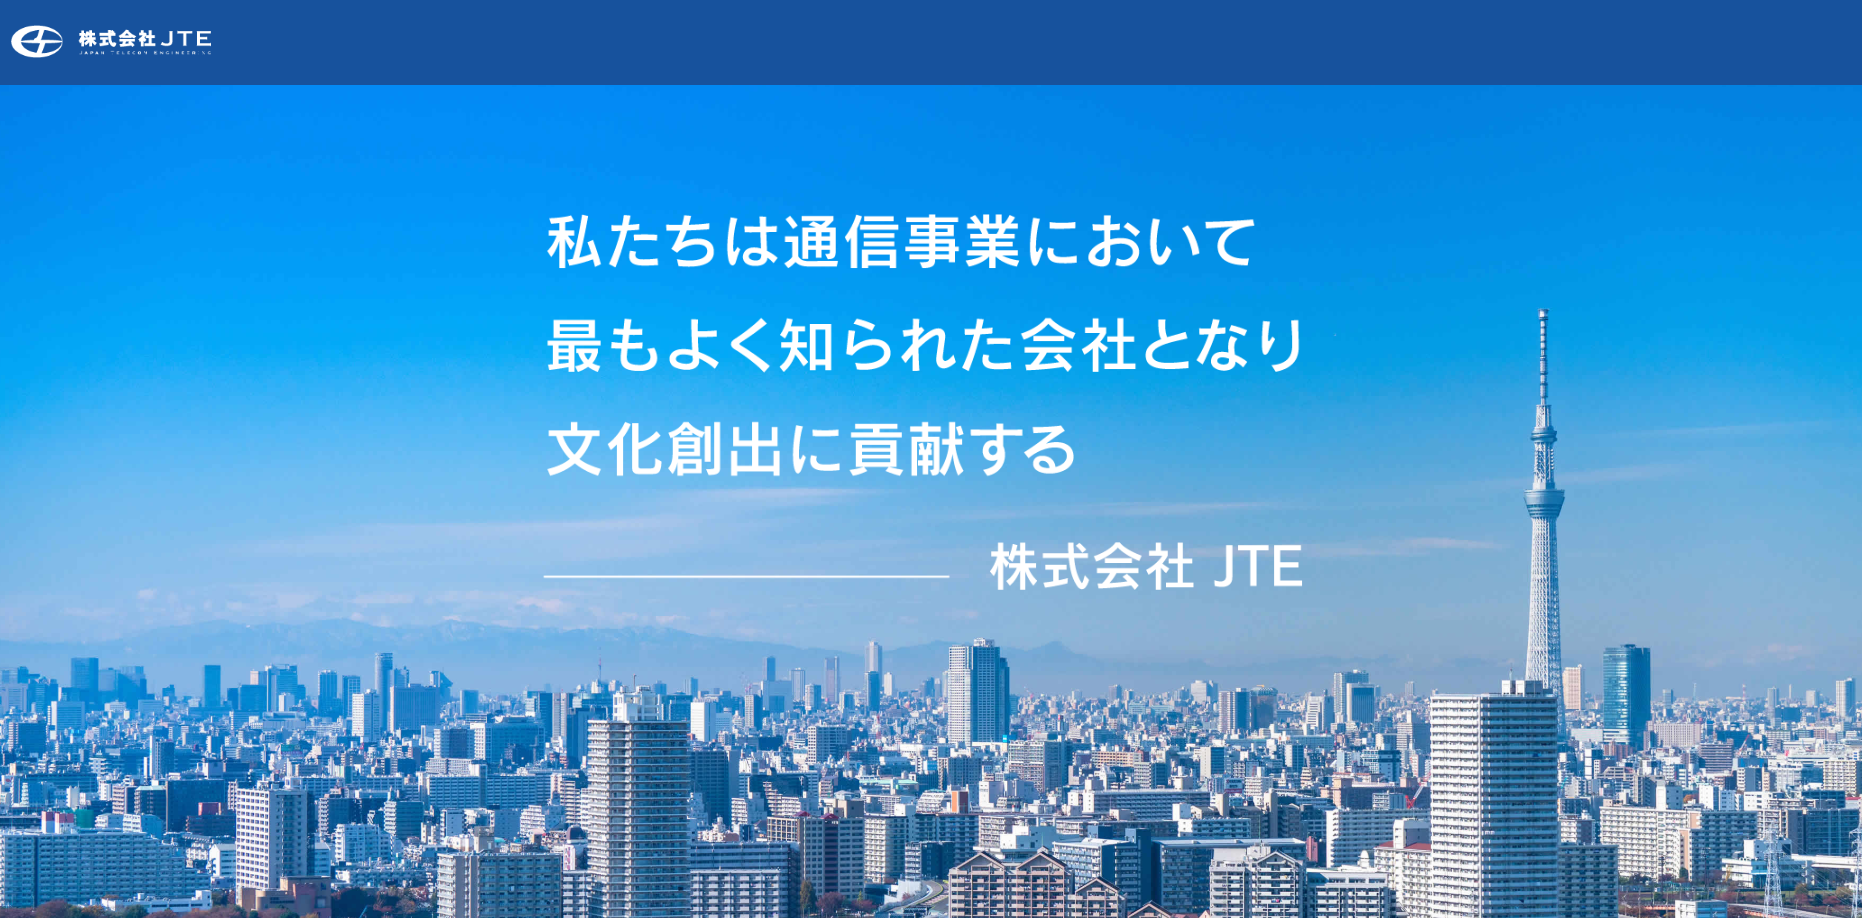 株式会社JTE